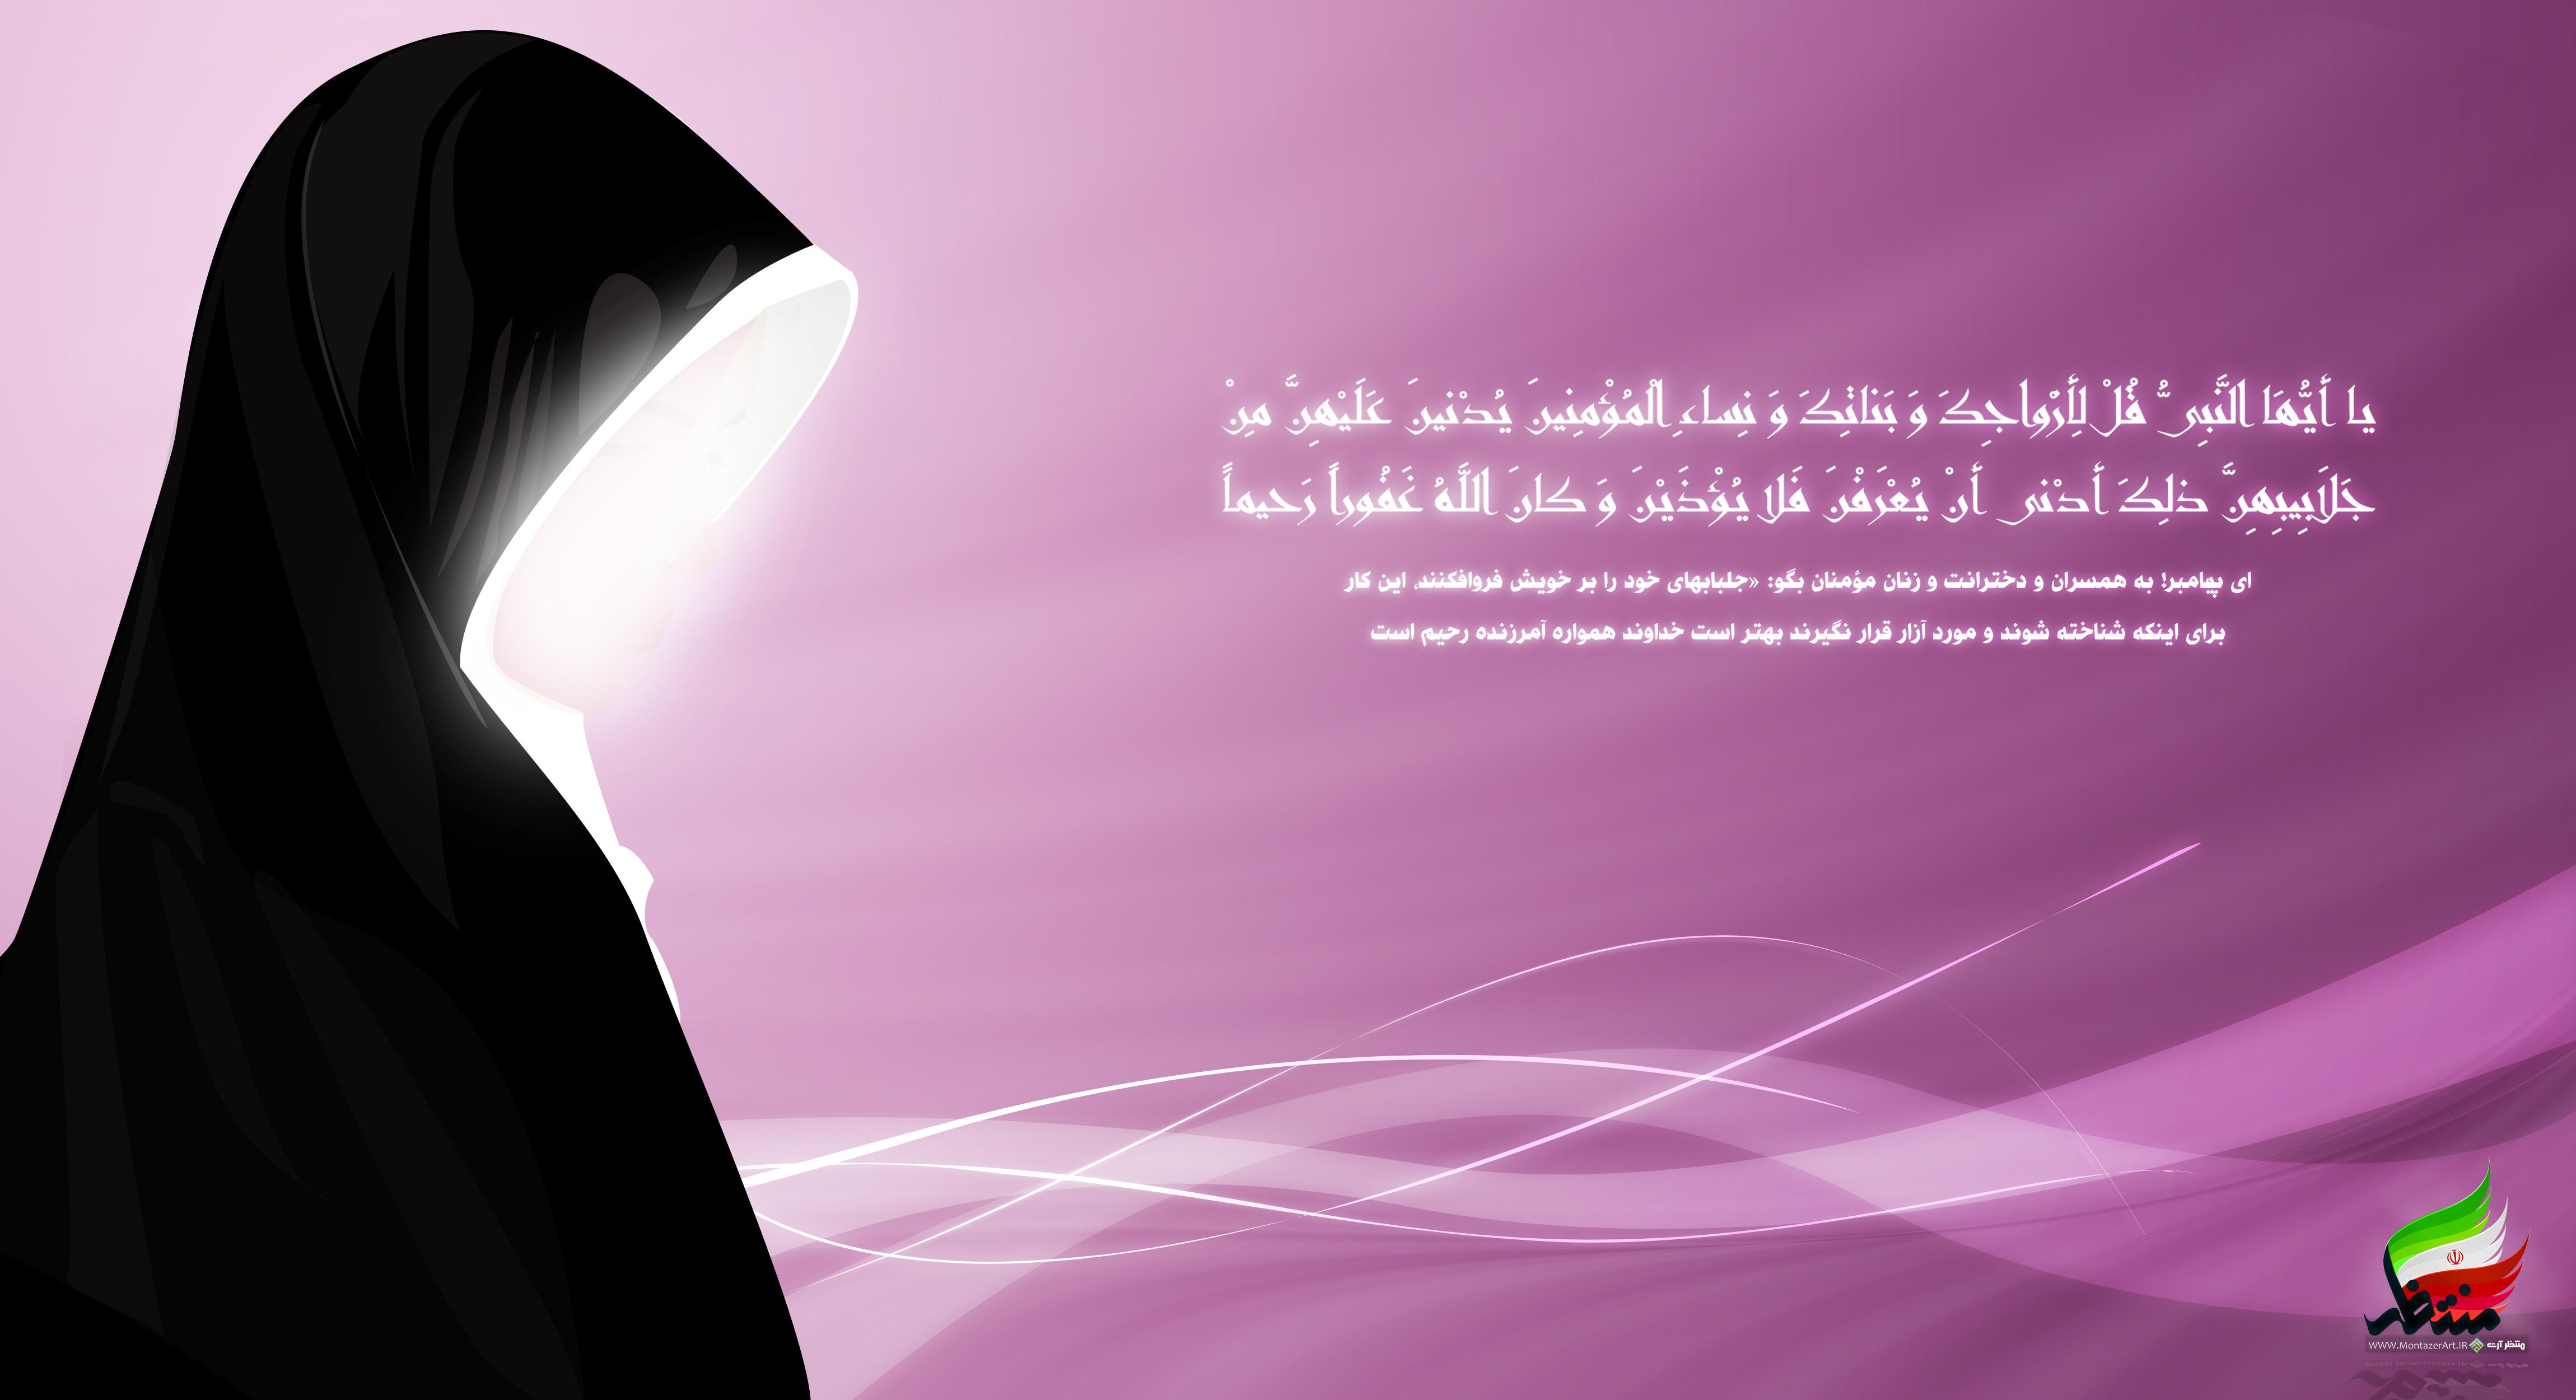 http://etesabphoto.persiangig.com/other/hijab-4600.jpg